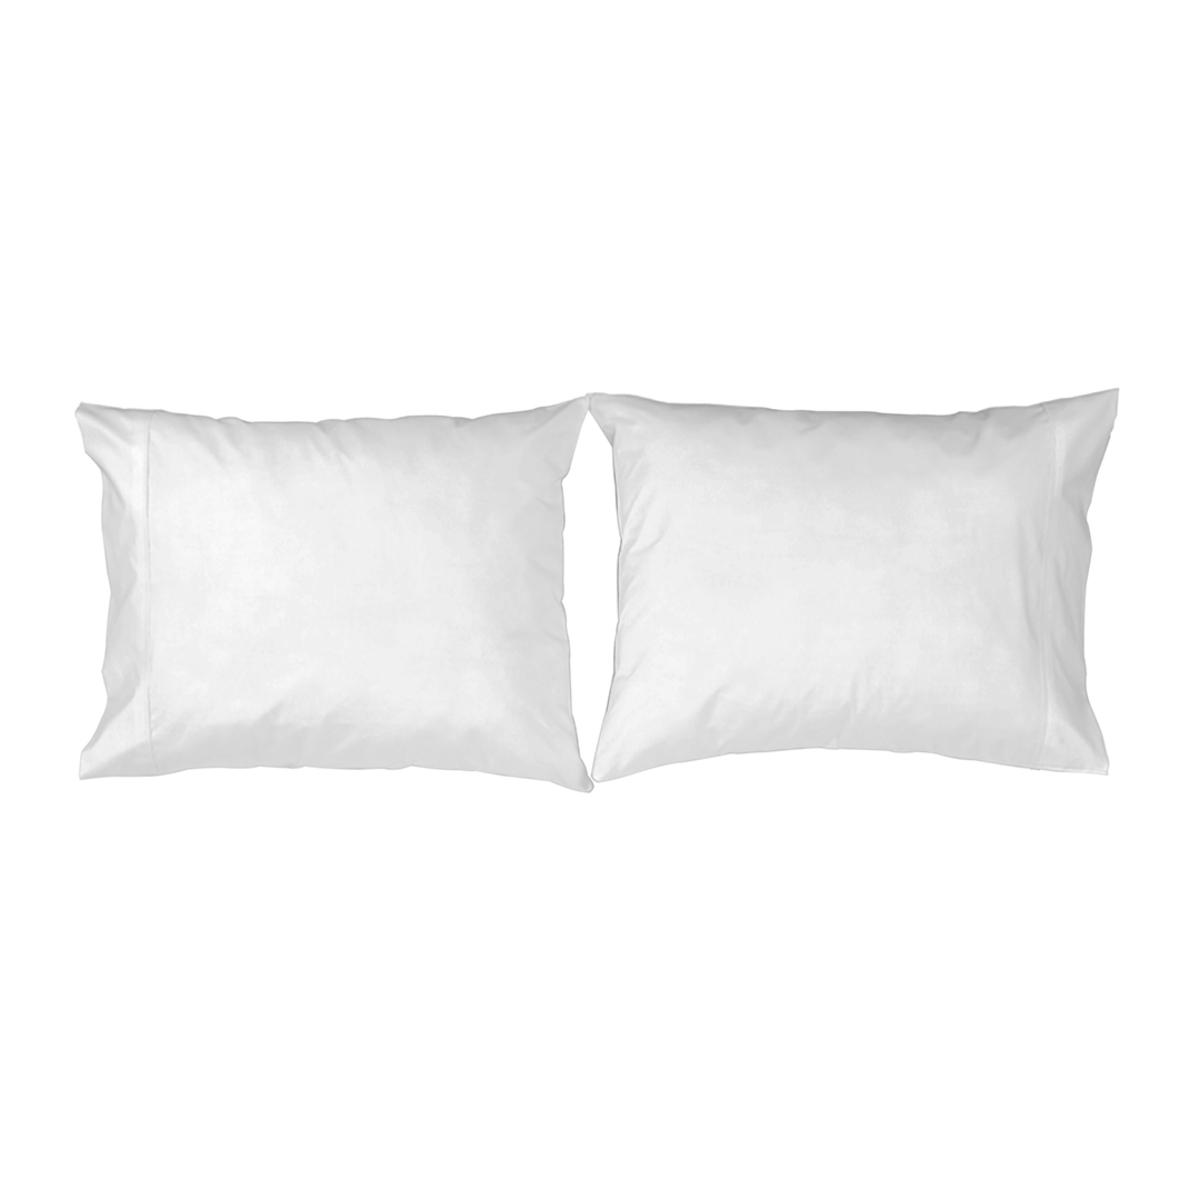 2 taies d'oreiller en coton blanc 50x75